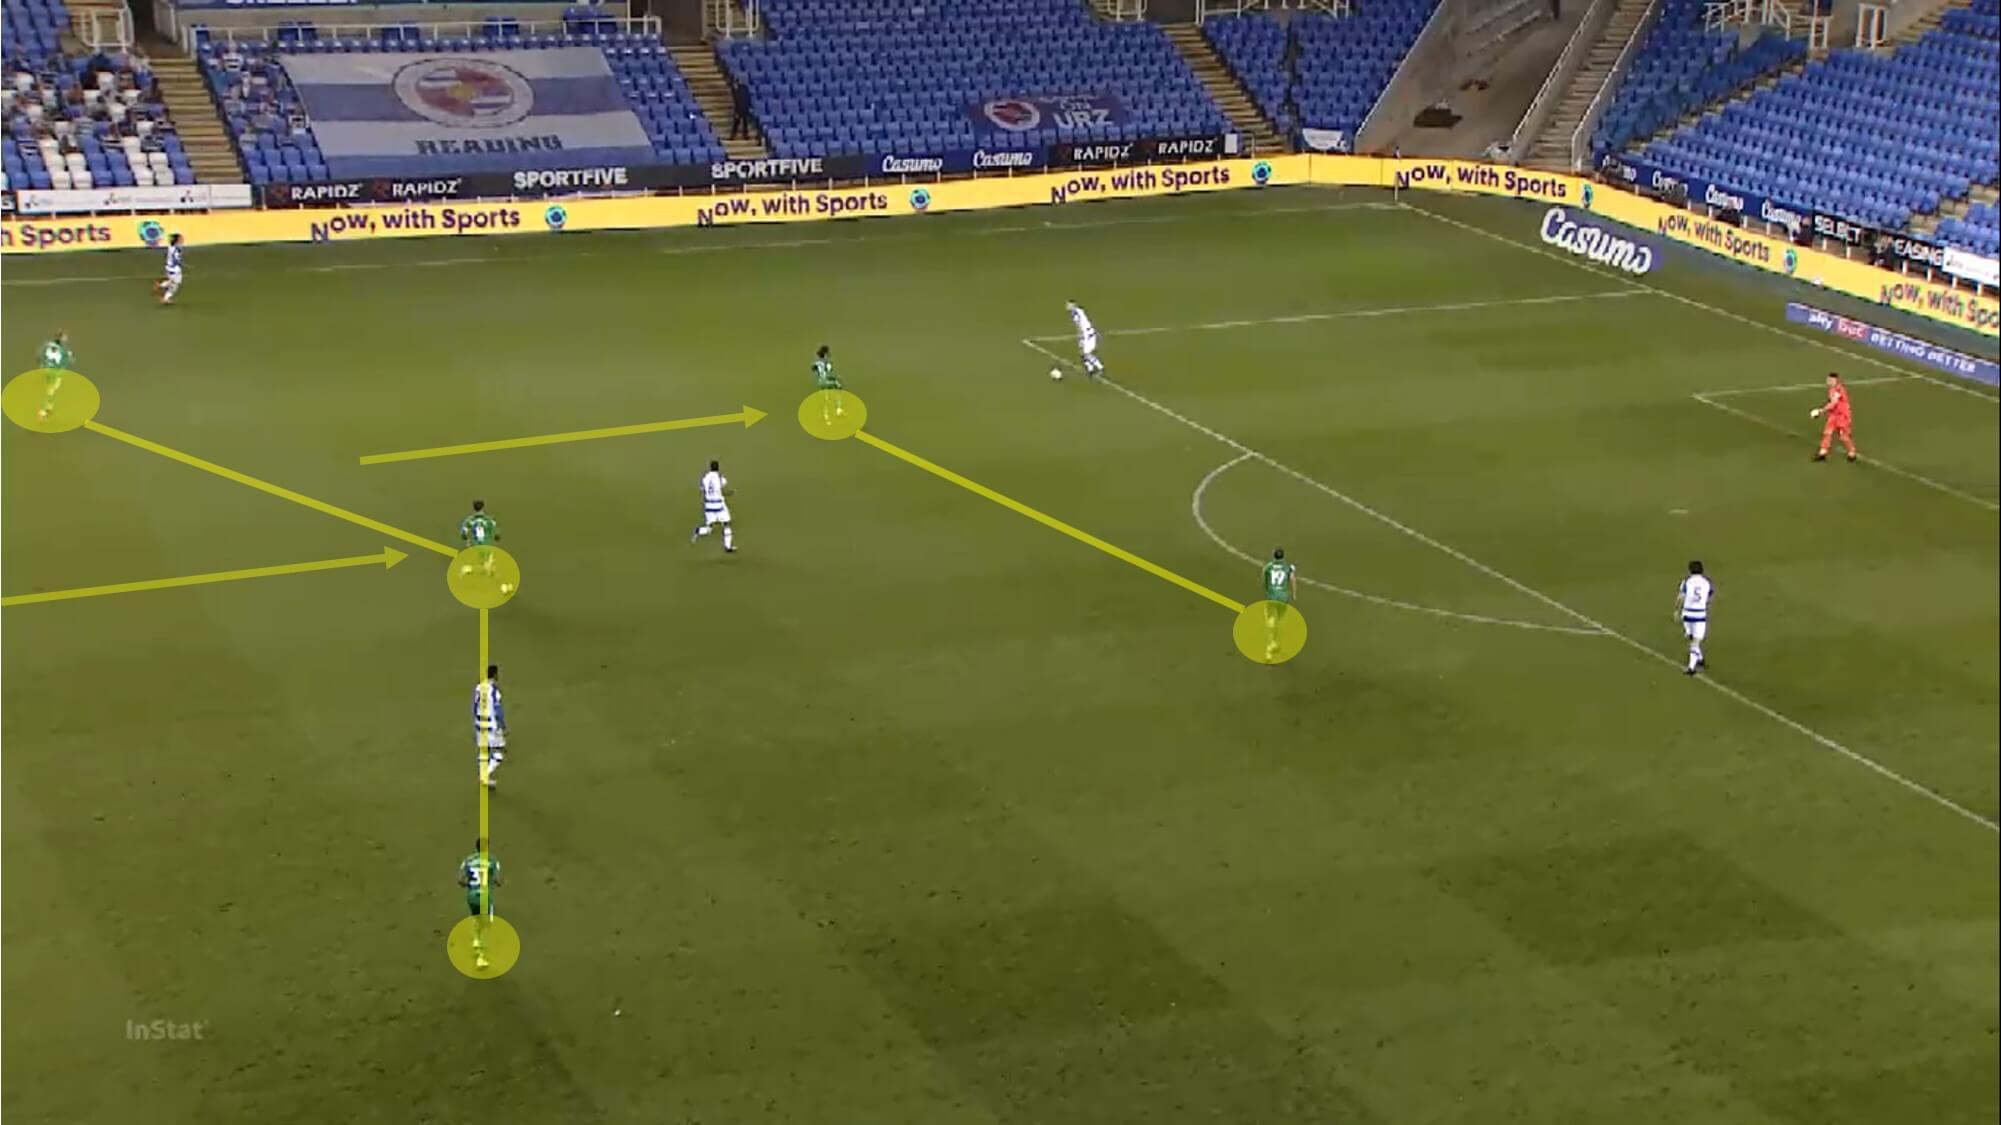 EFL Championship 2020/21: Reading vs Preston North End - tactical analysis - tactics